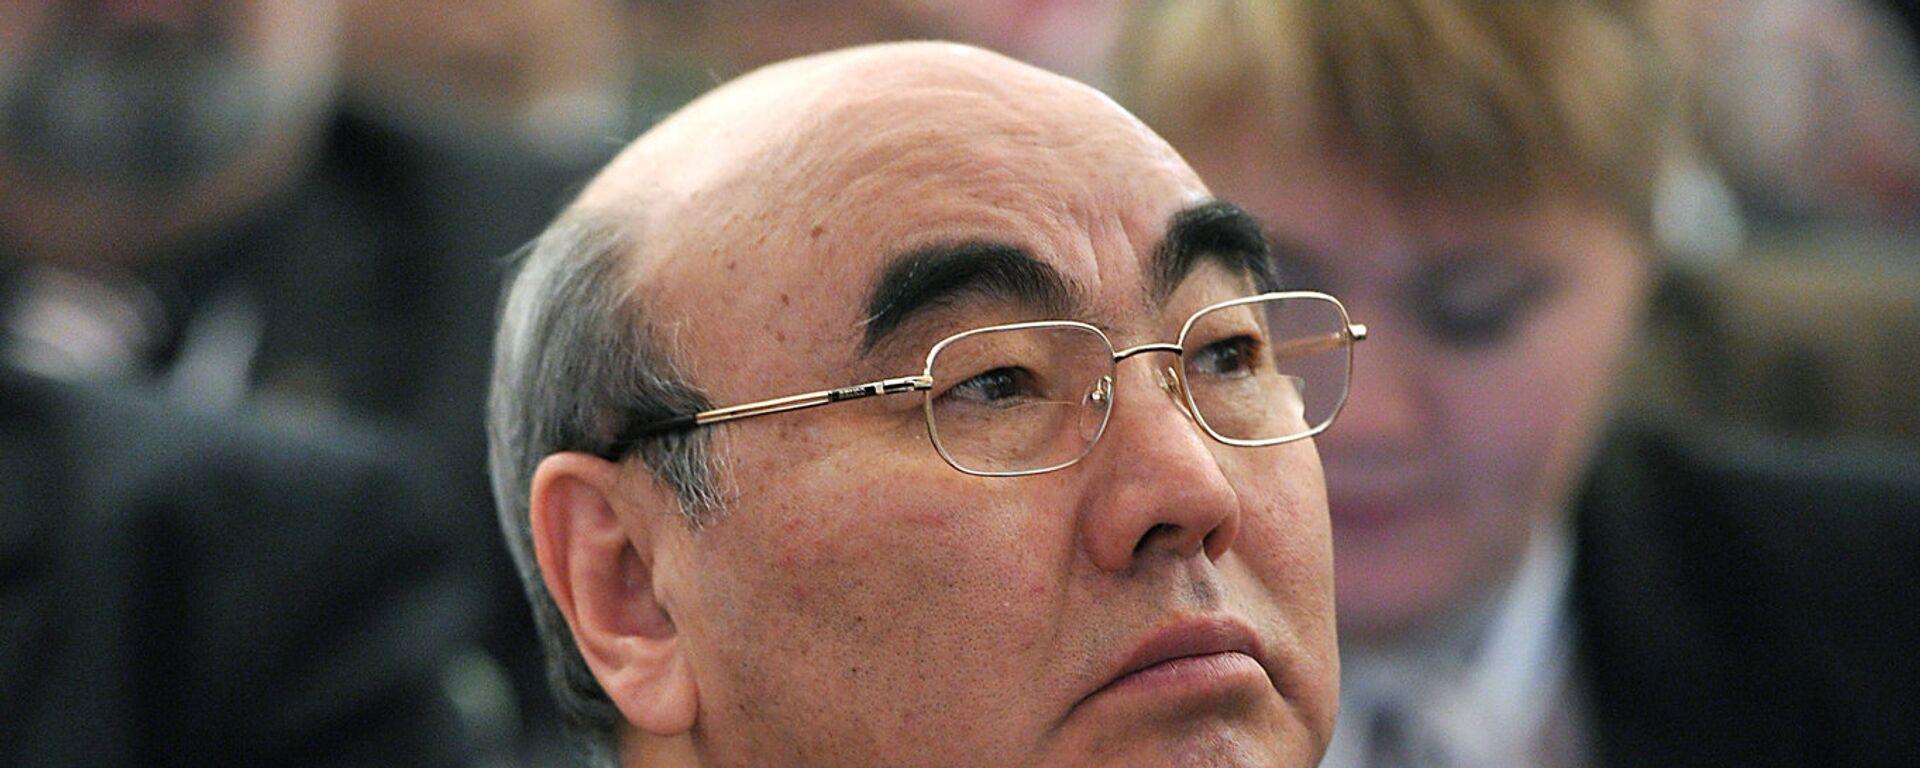 Бывший президент Кыргызстана Аскар Акаев, архивное фото - Sputnik Таджикистан, 1920, 21.05.2021